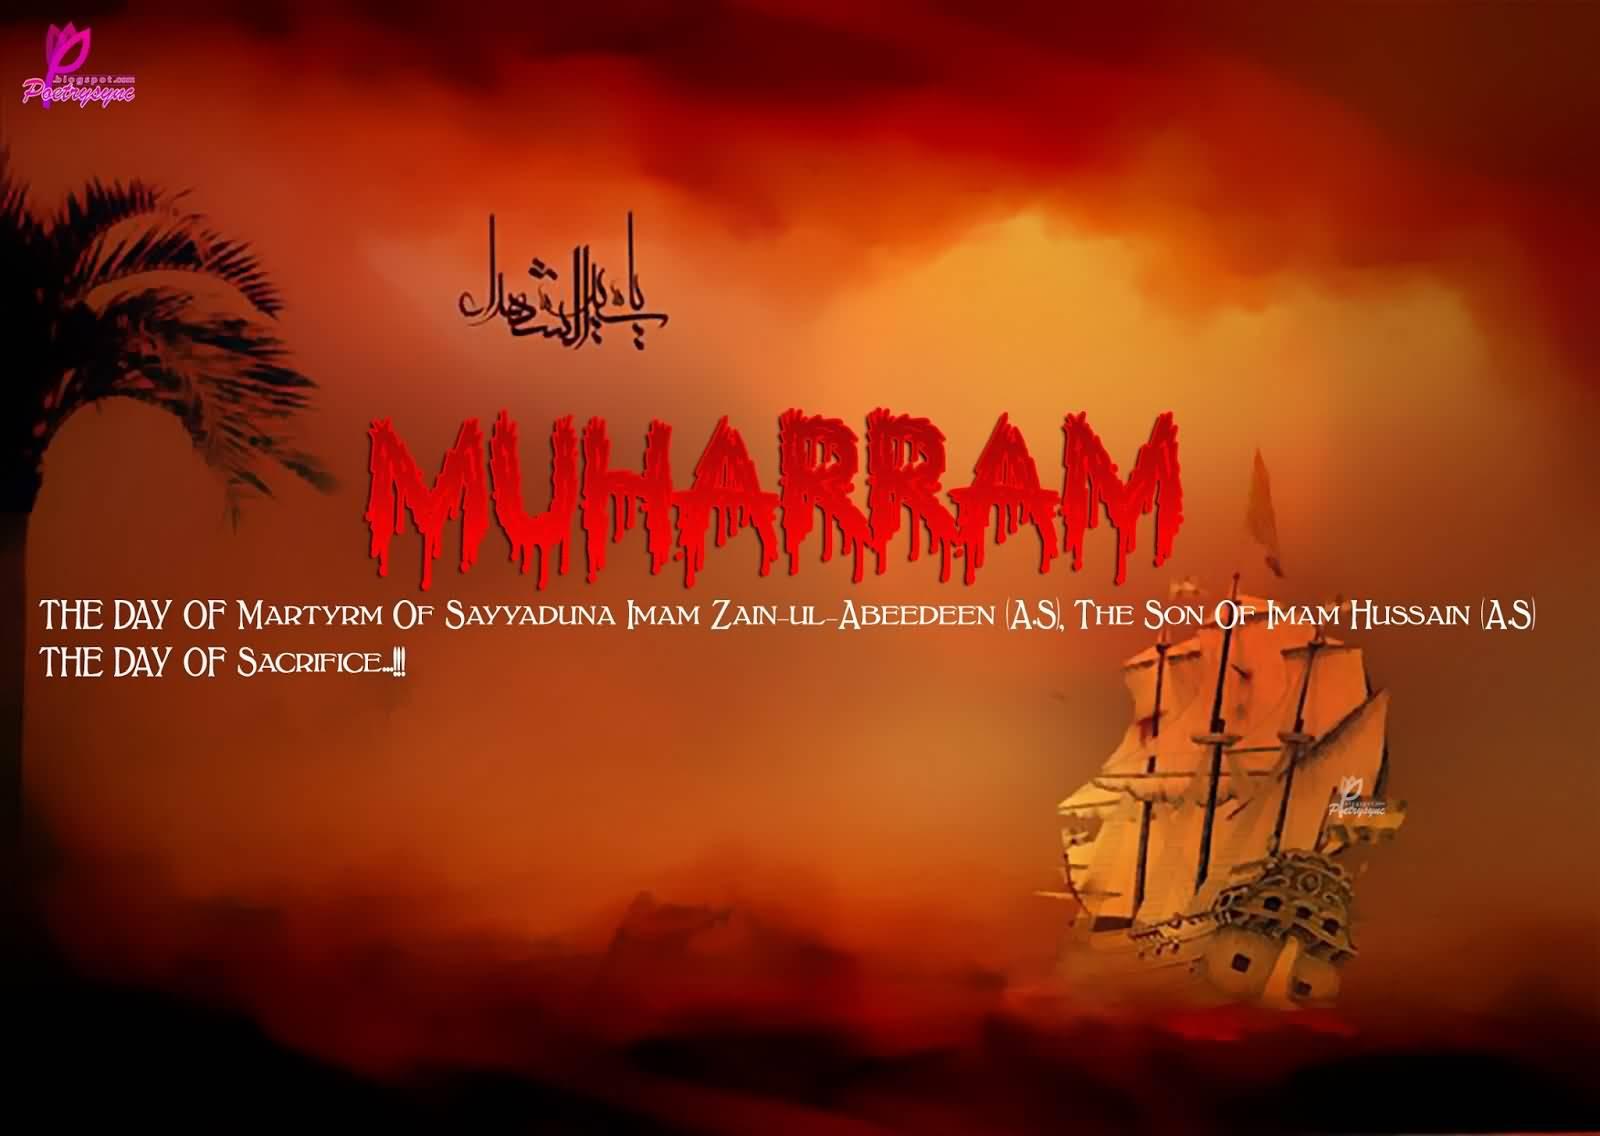 Happy Muharram Hd Greetings Pictures For Desktop